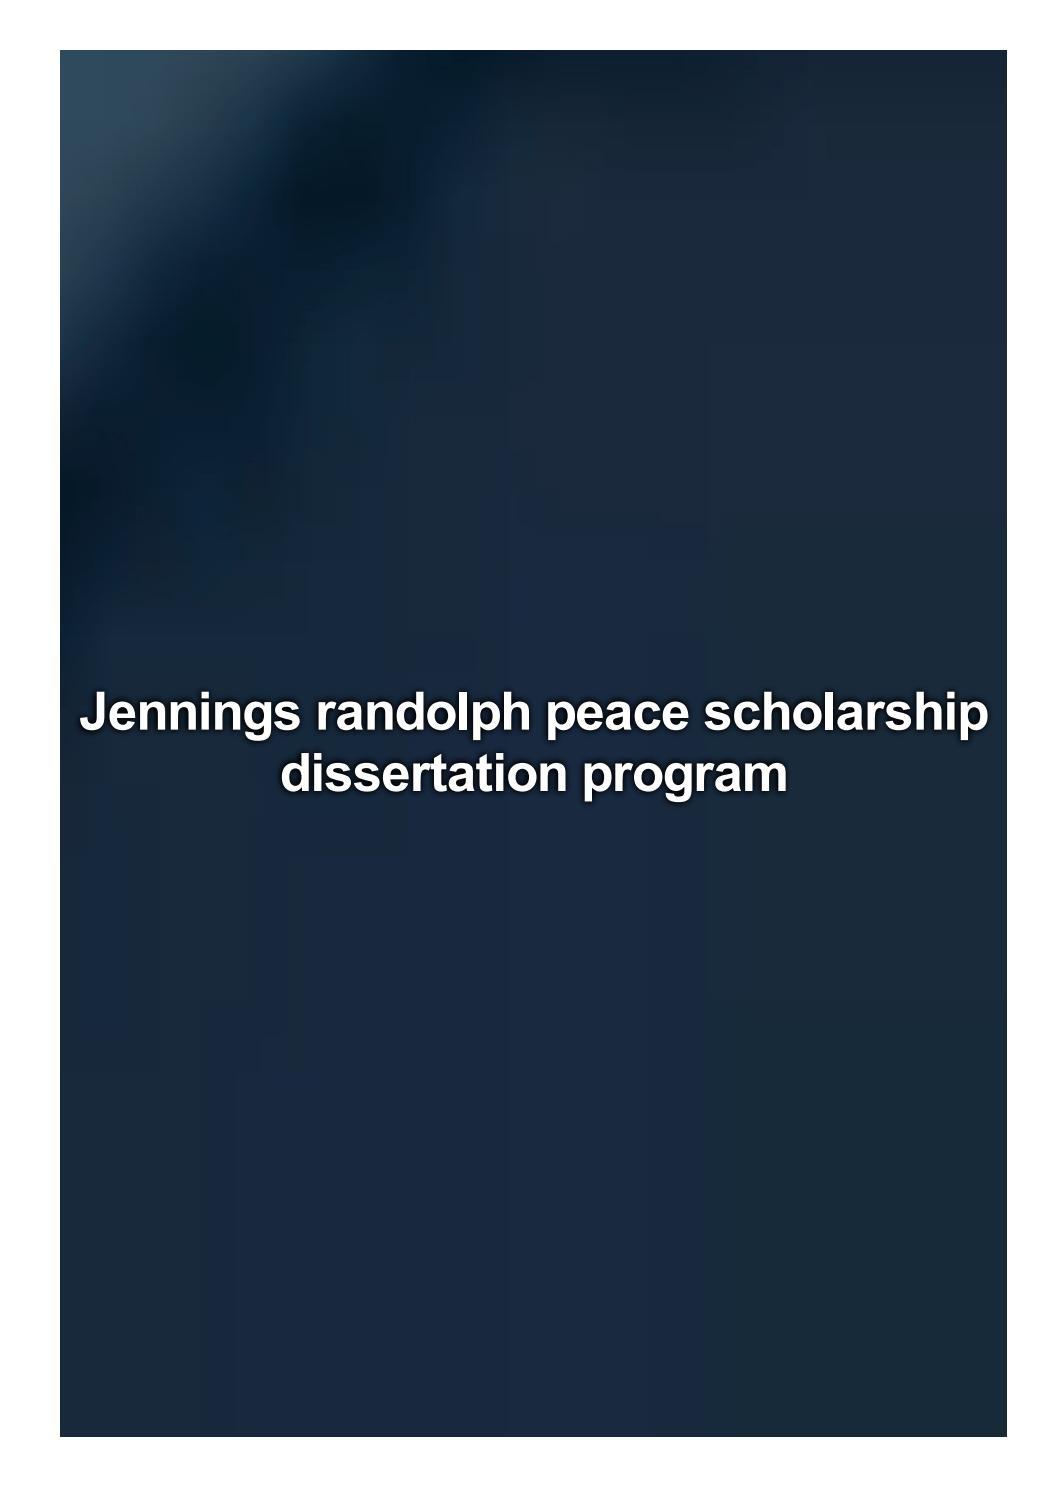 Jennings randolph peace scholarship dissertation program academic argumentative essay